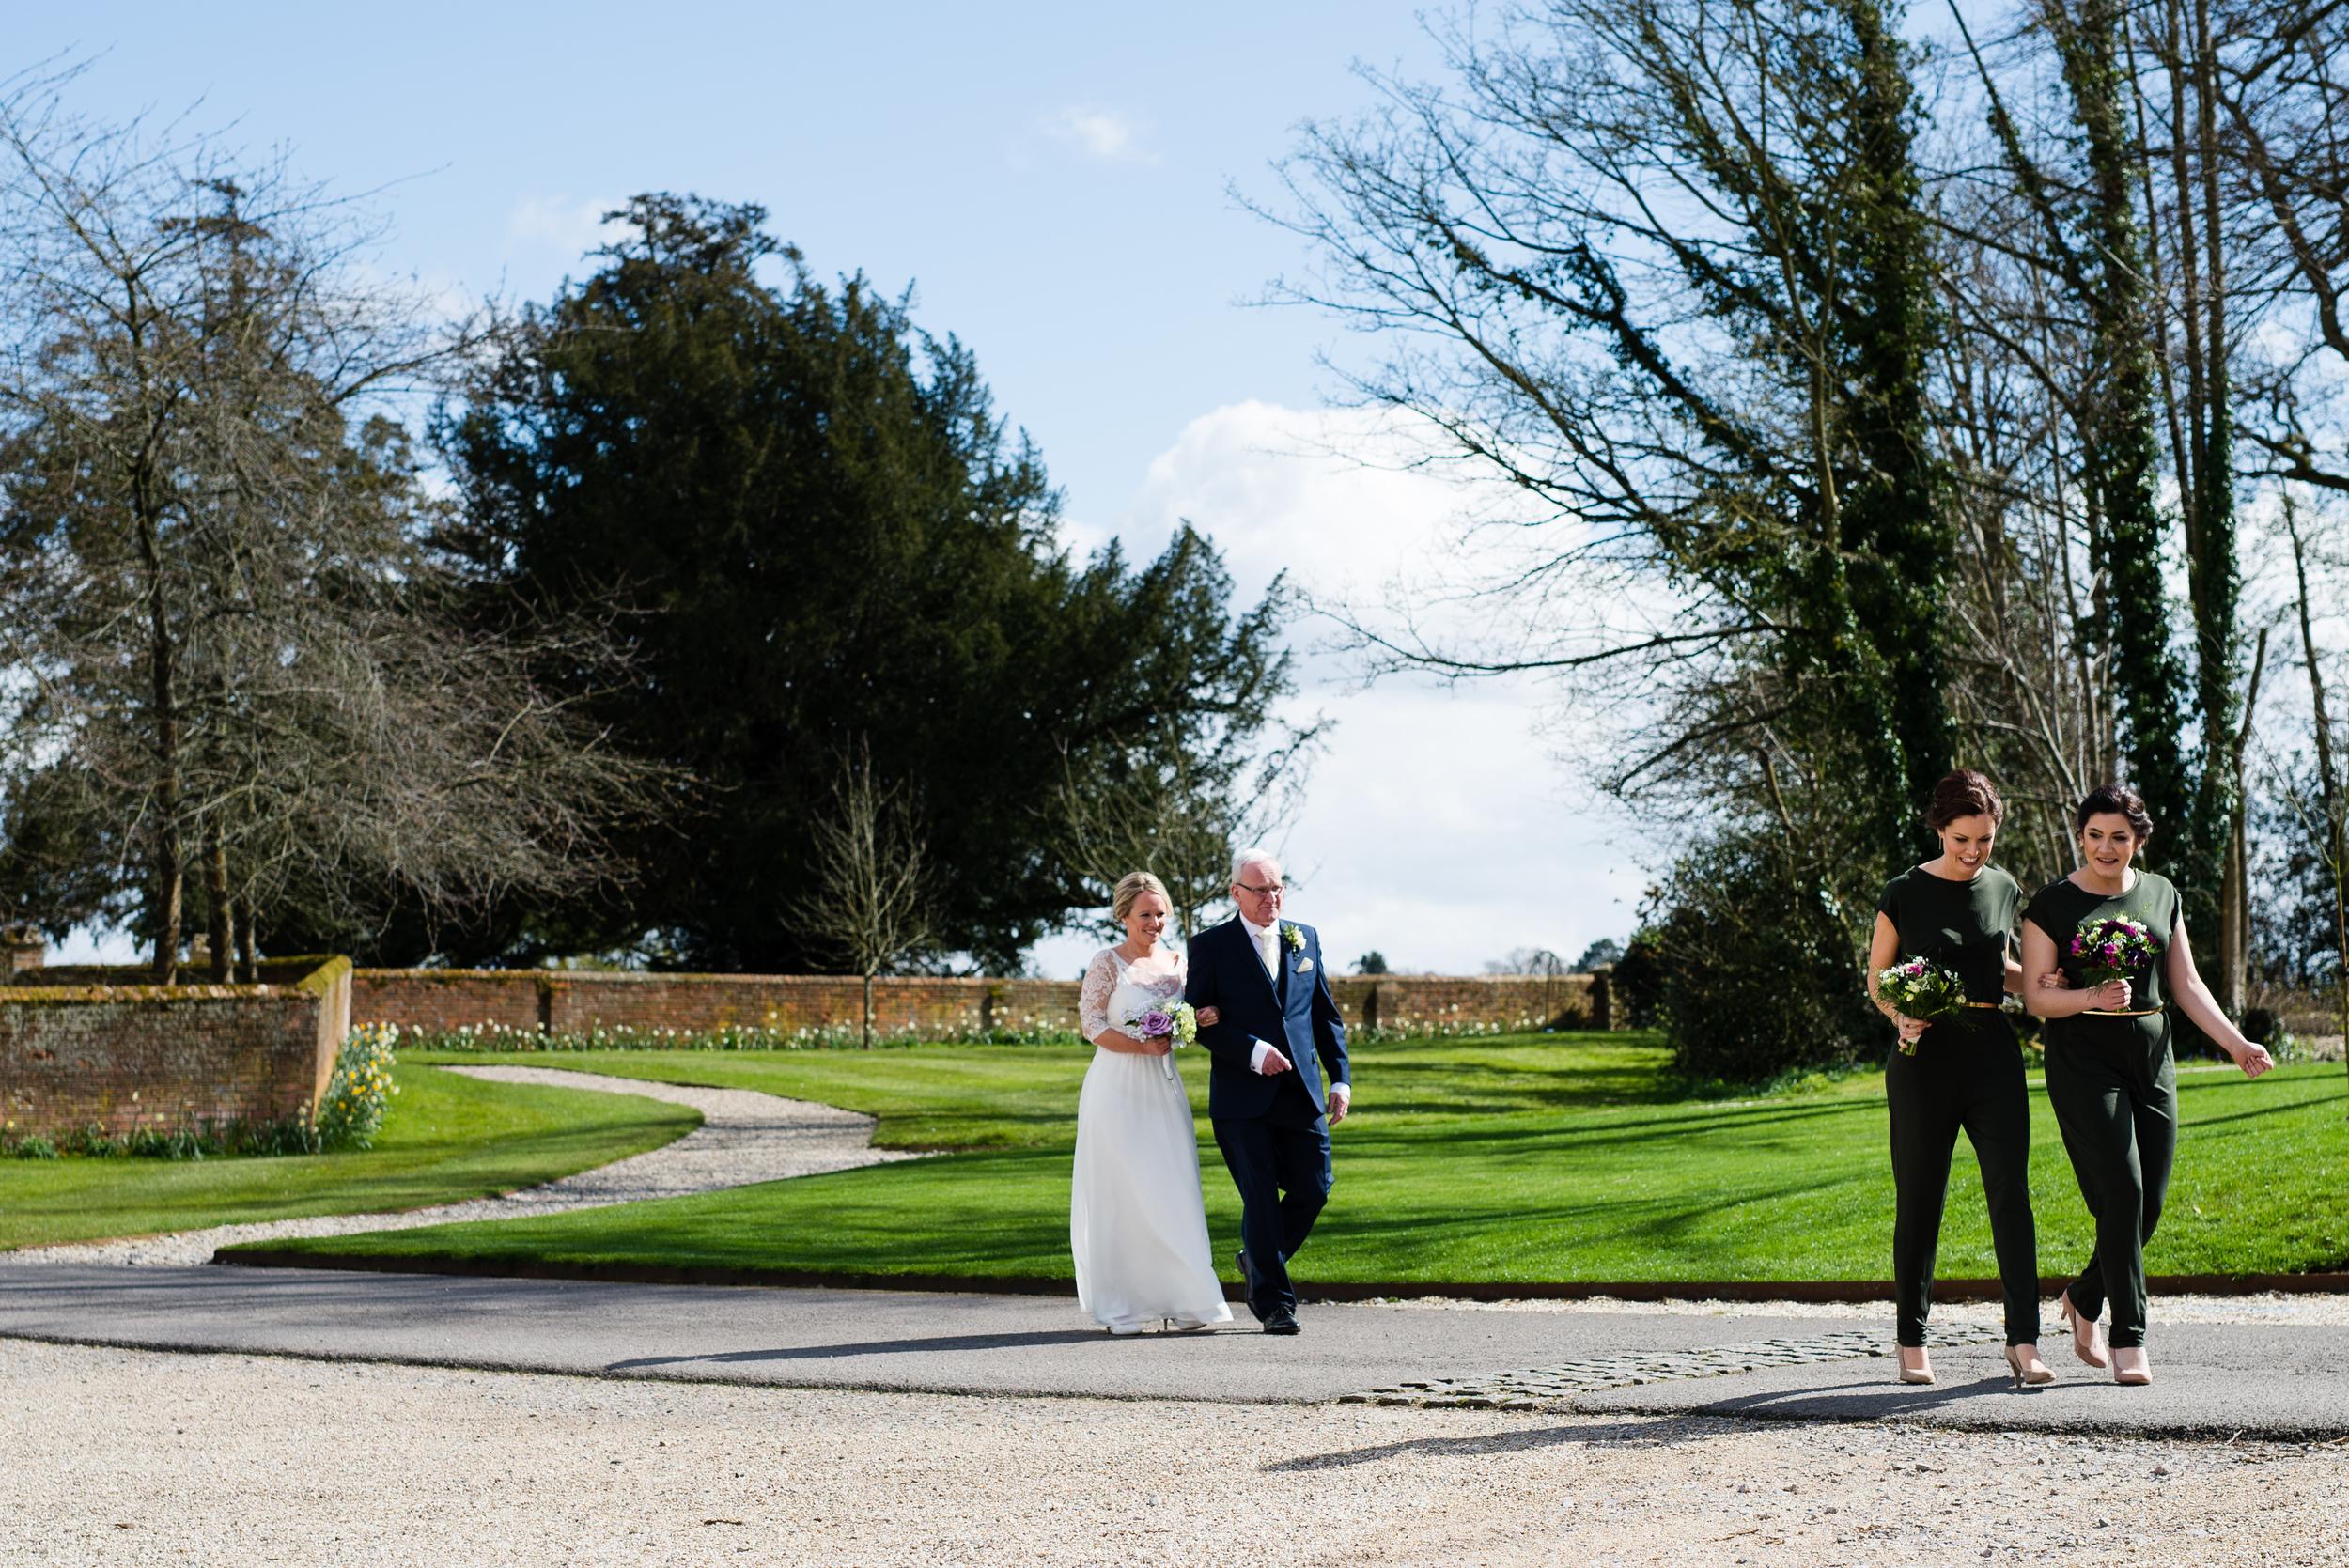 Wasing Park Wedding Photography - Emma & Sarah-105.jpg